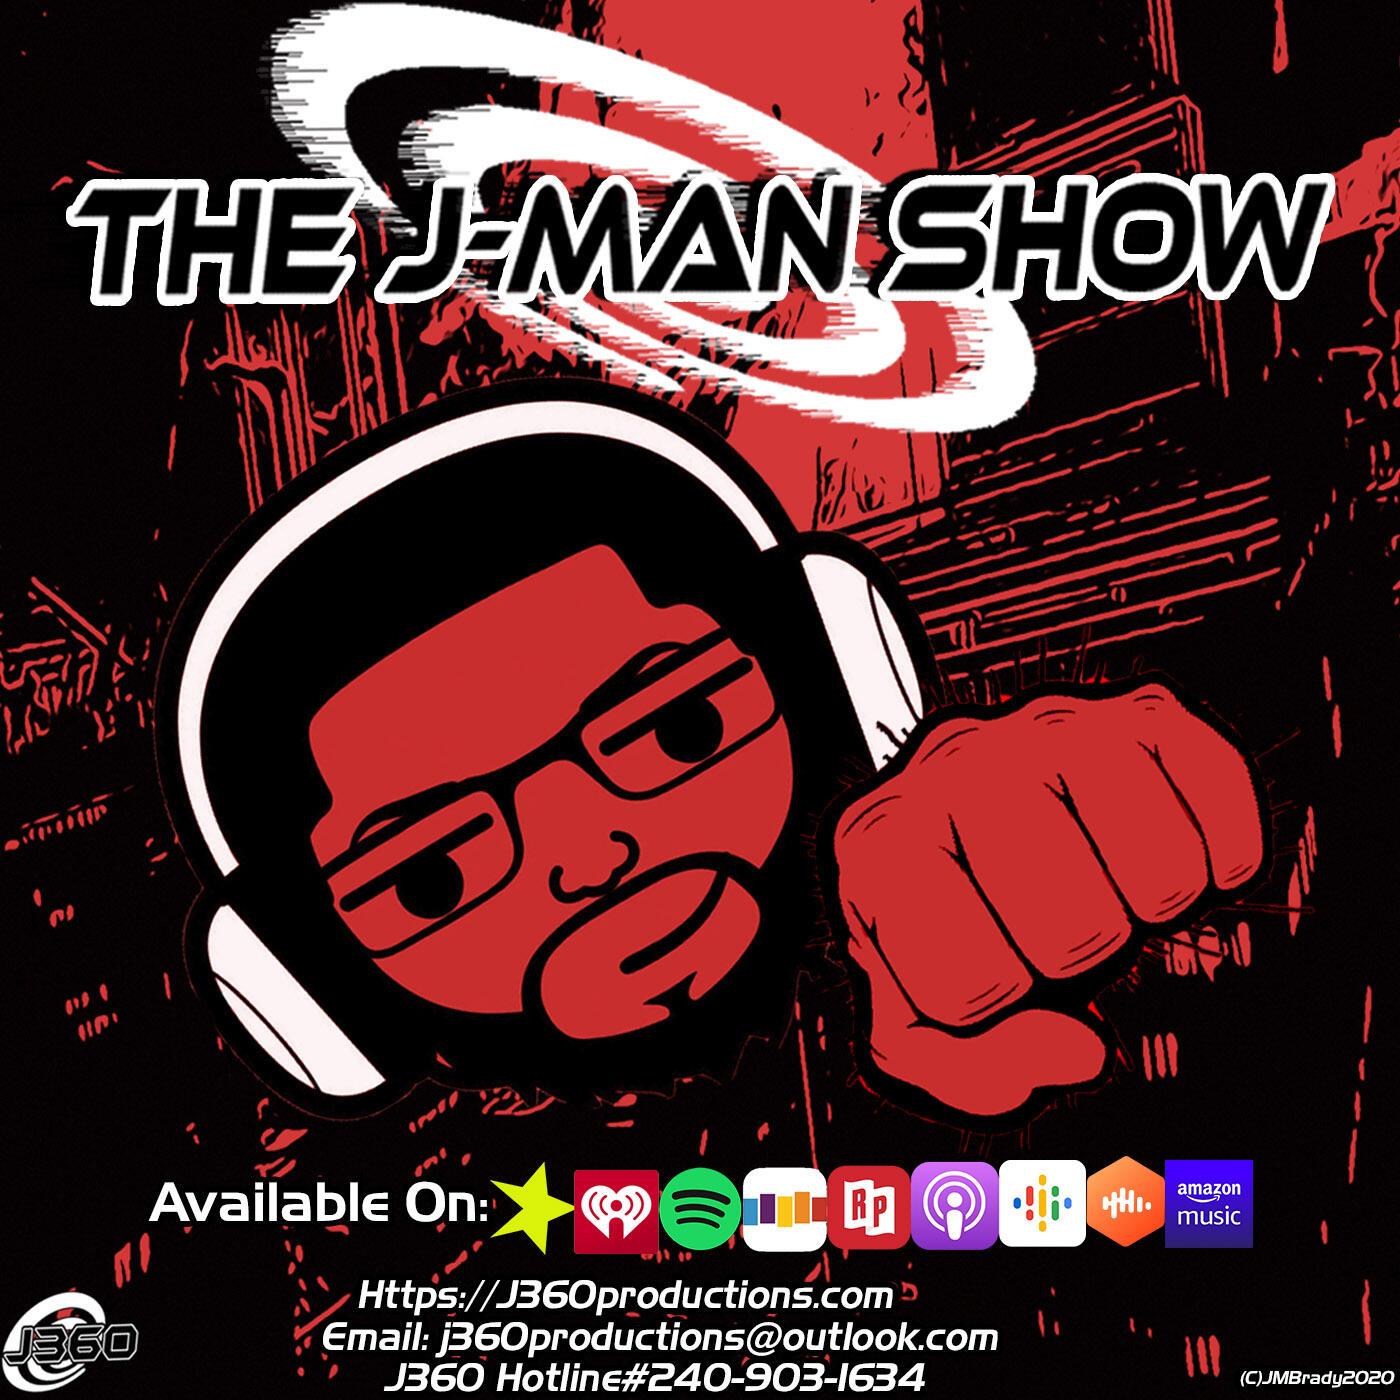 The J-Man Show